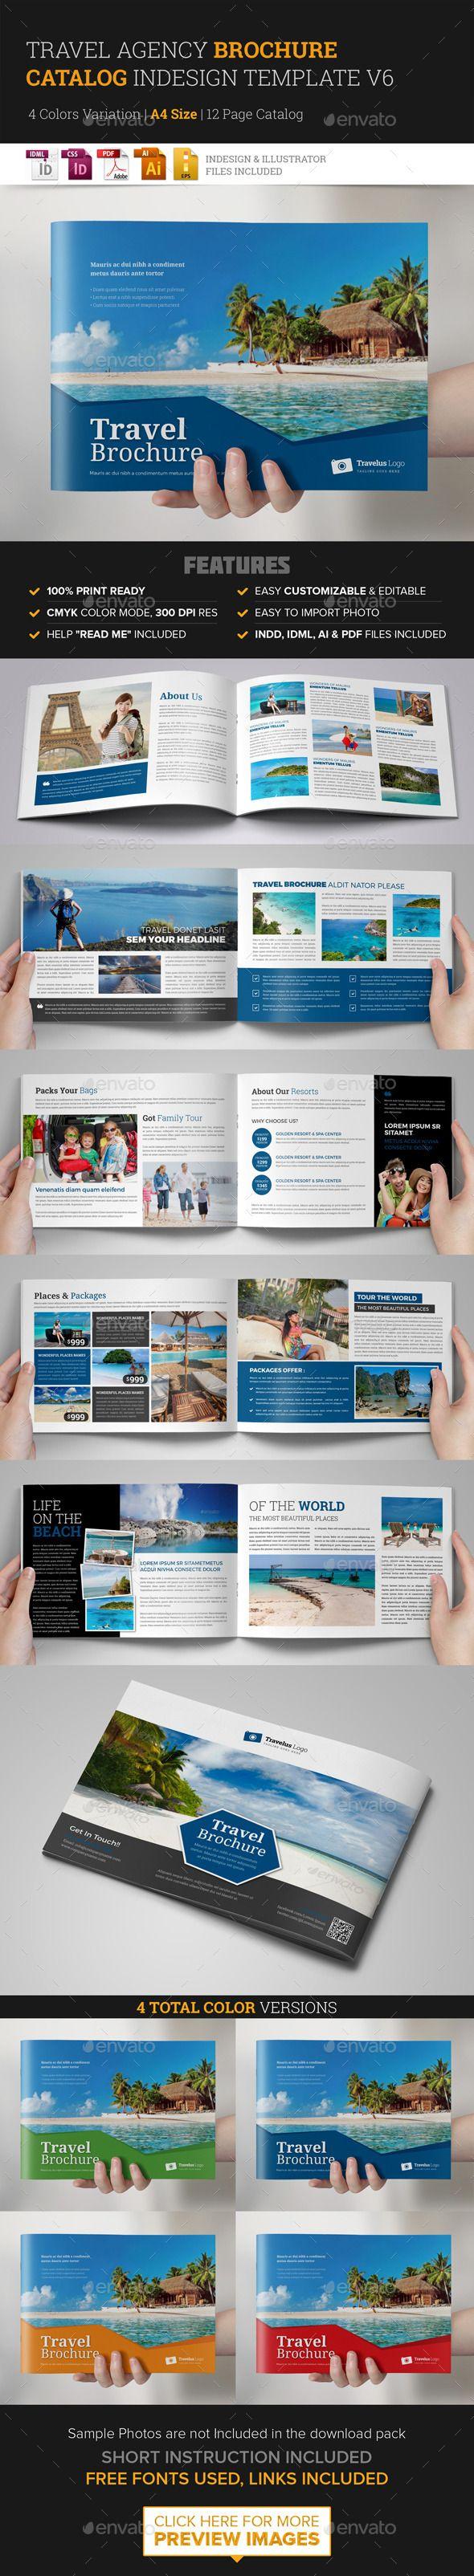 Travel Brochure Catalog InDesign Template v6 | Diseño editorial ...